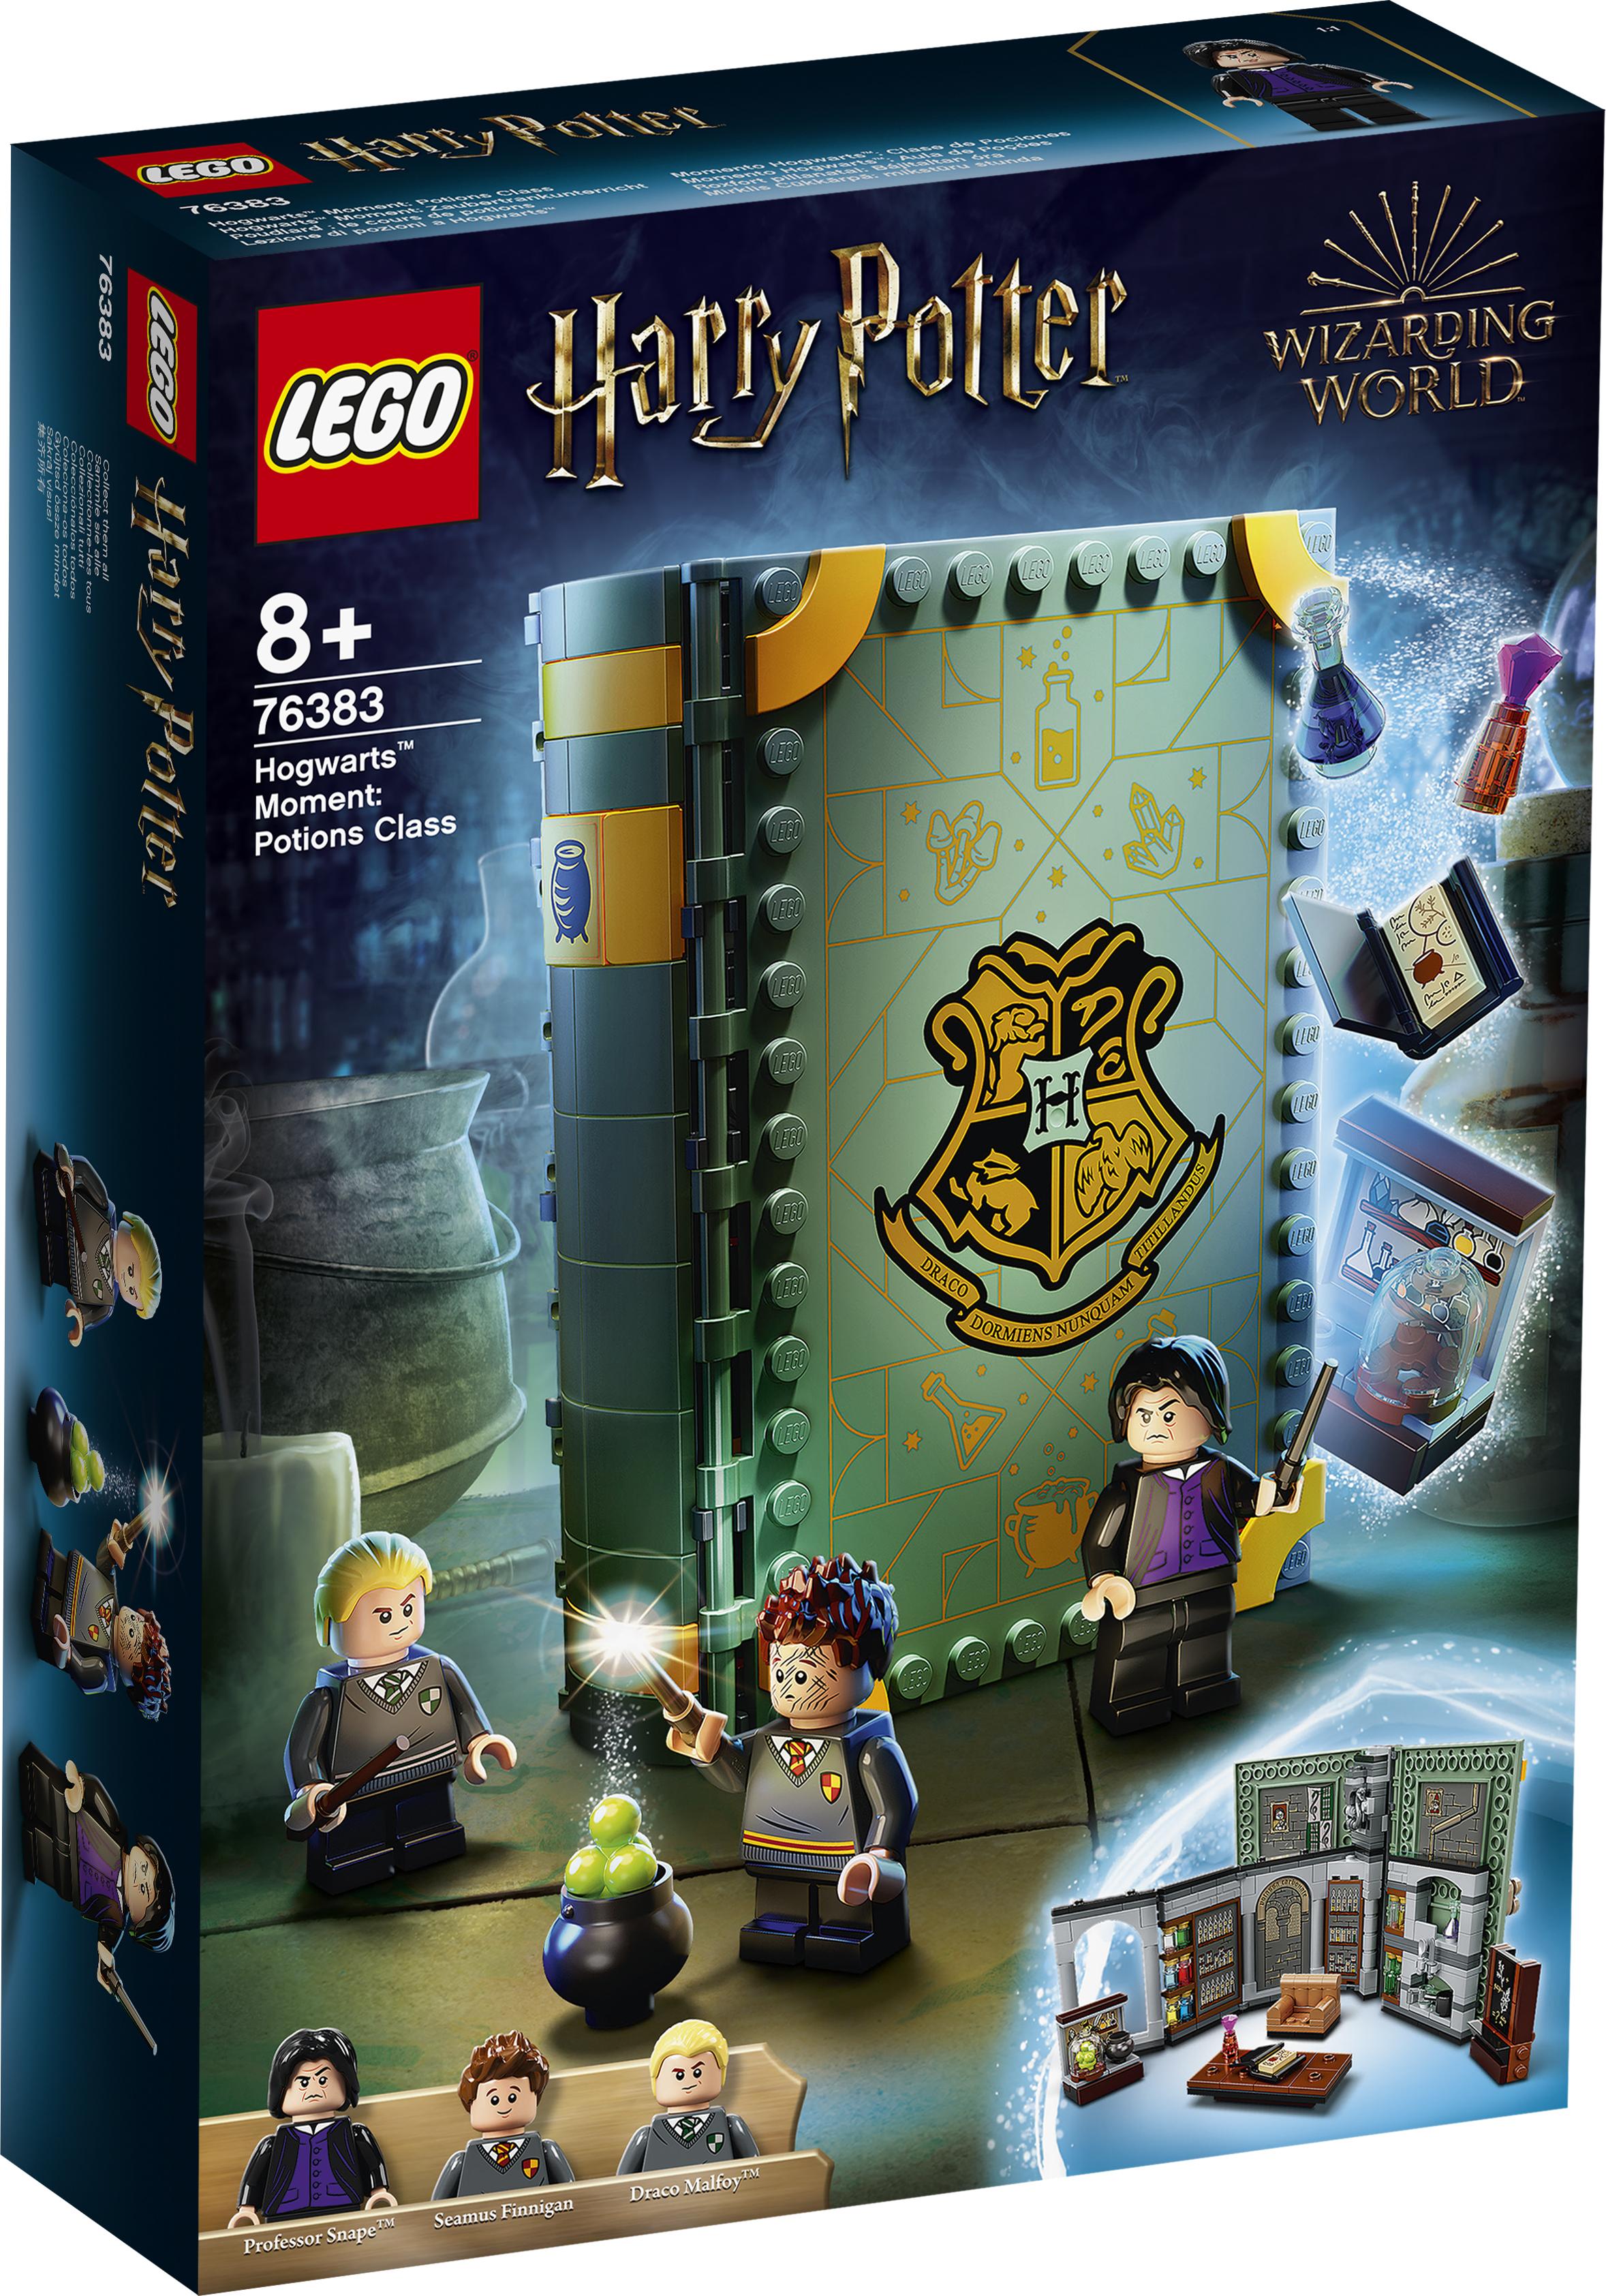 LEGO Harry Potter Hogwarts eliksirlektion - 76383